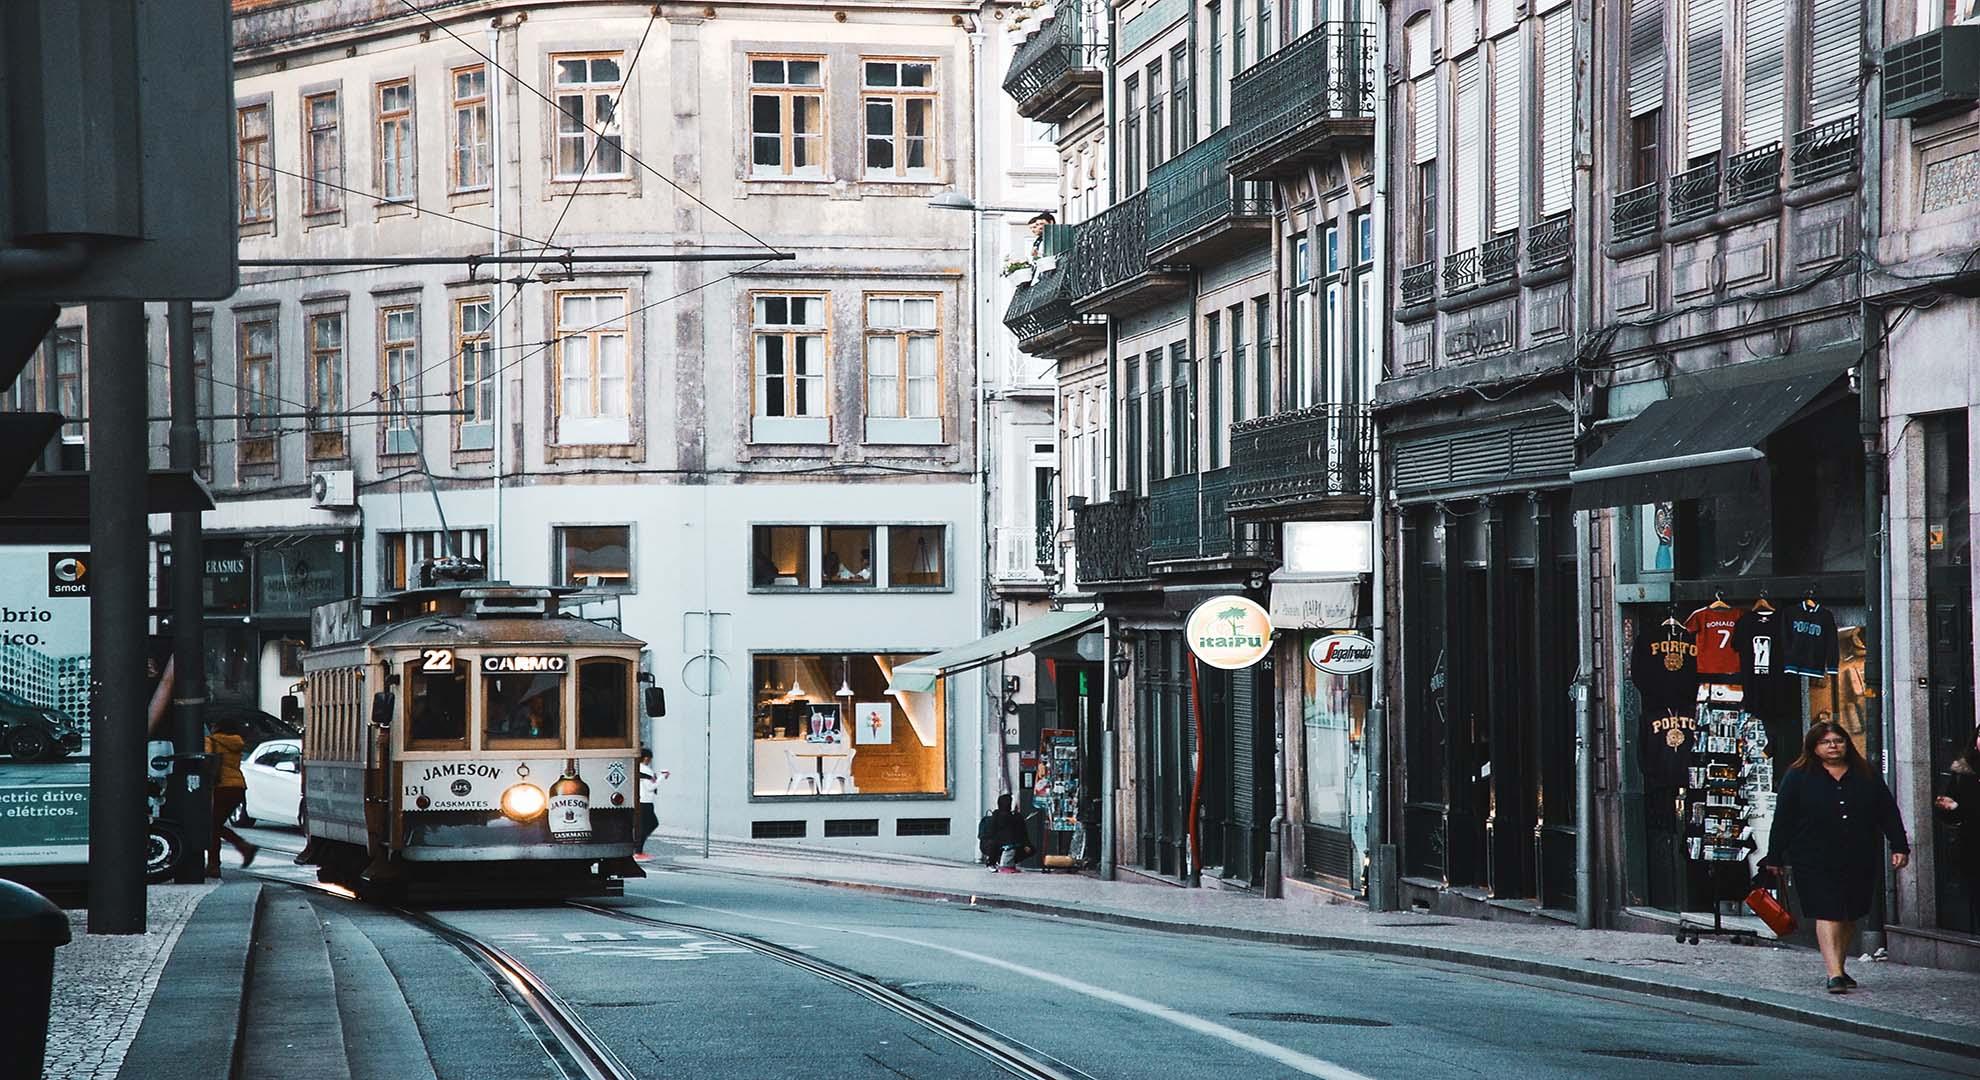 Porto tram, Portugal